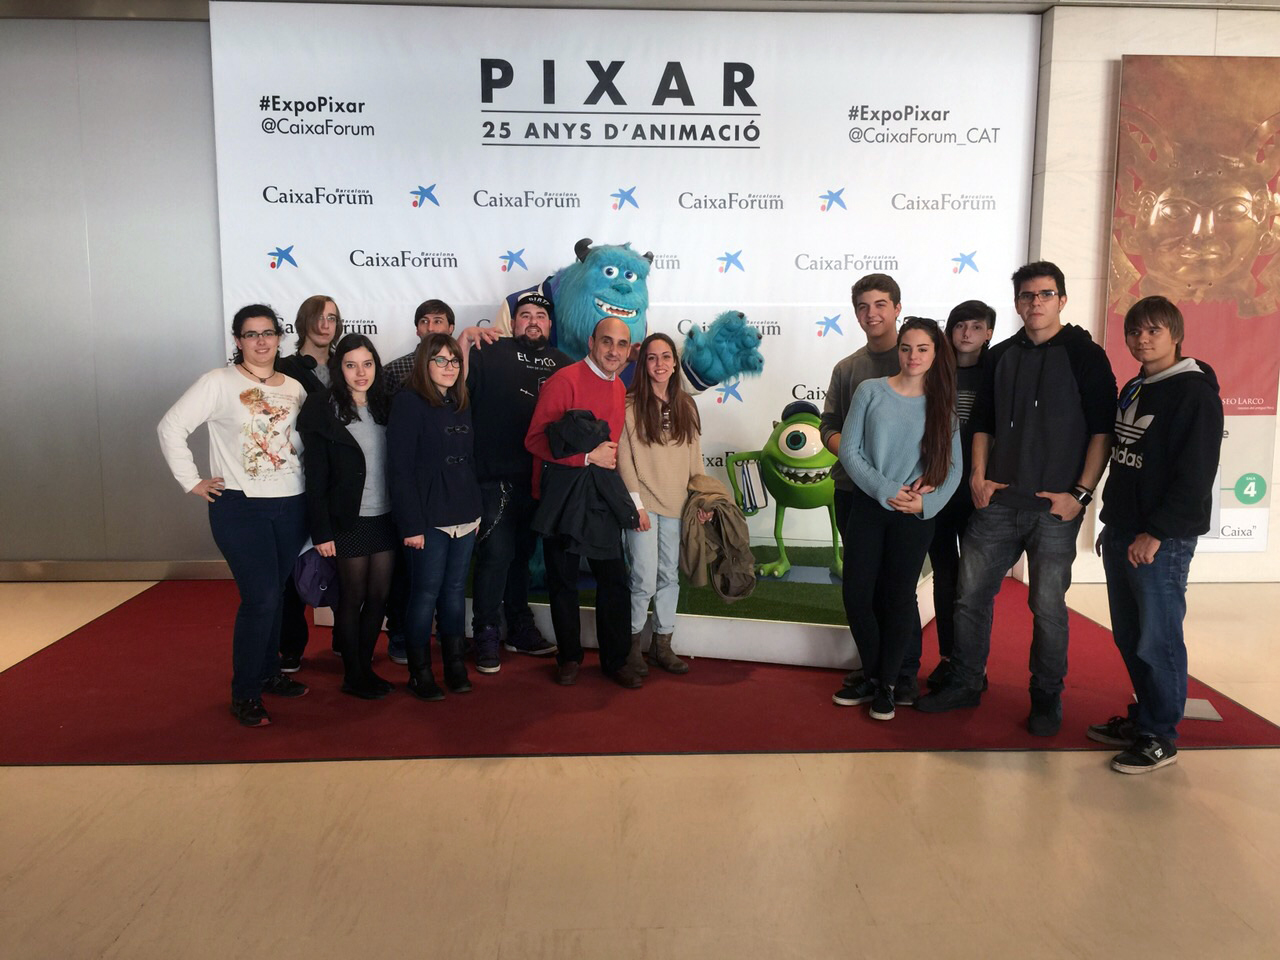 diseño-visita-pixar-barreira